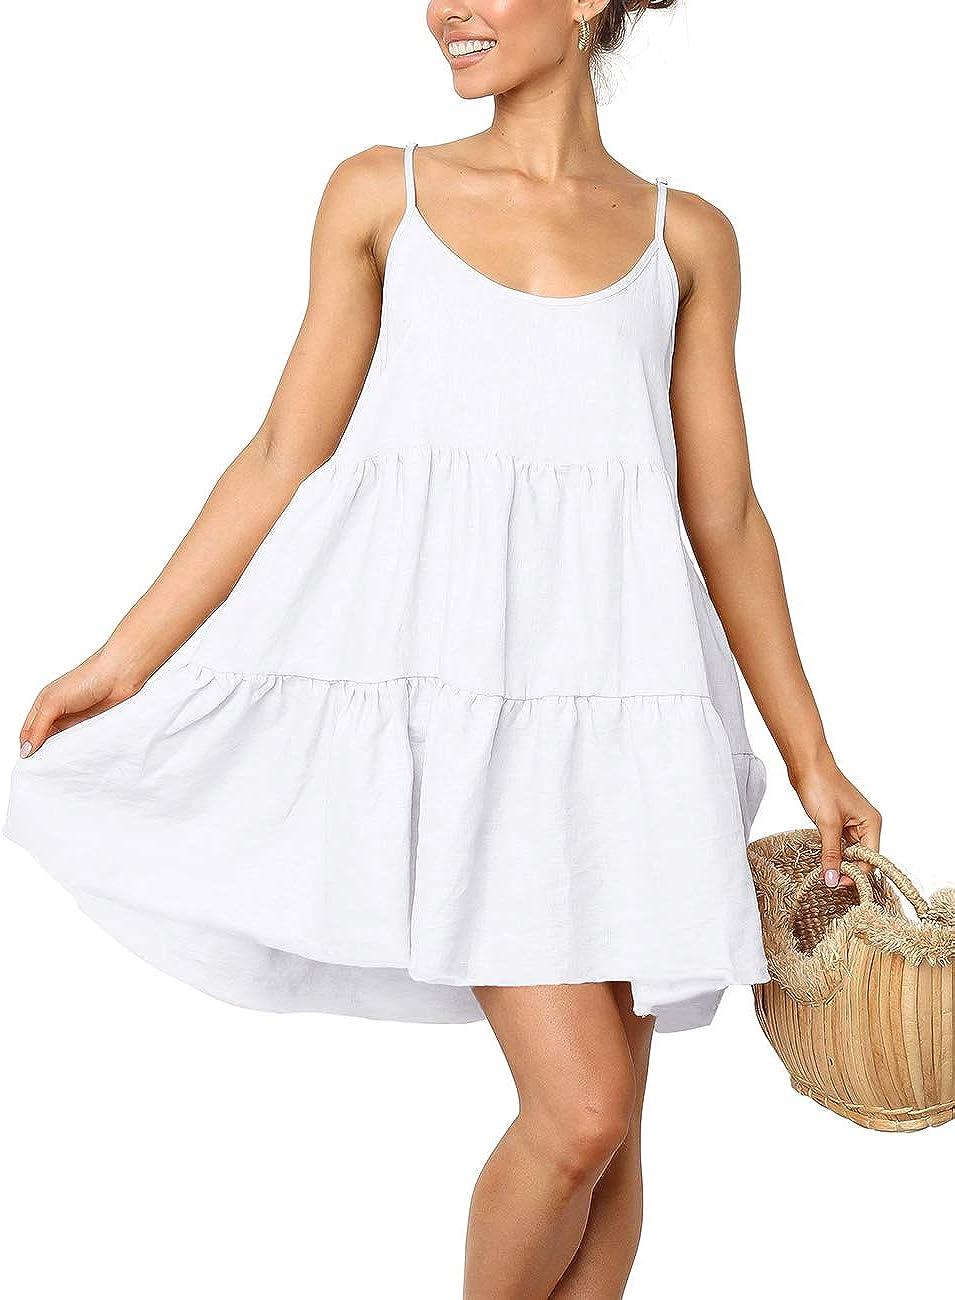 LOMON Swimsuit Cover Up Dress Mini Short Flowy Skater Dresses Maxi Dress White,Large